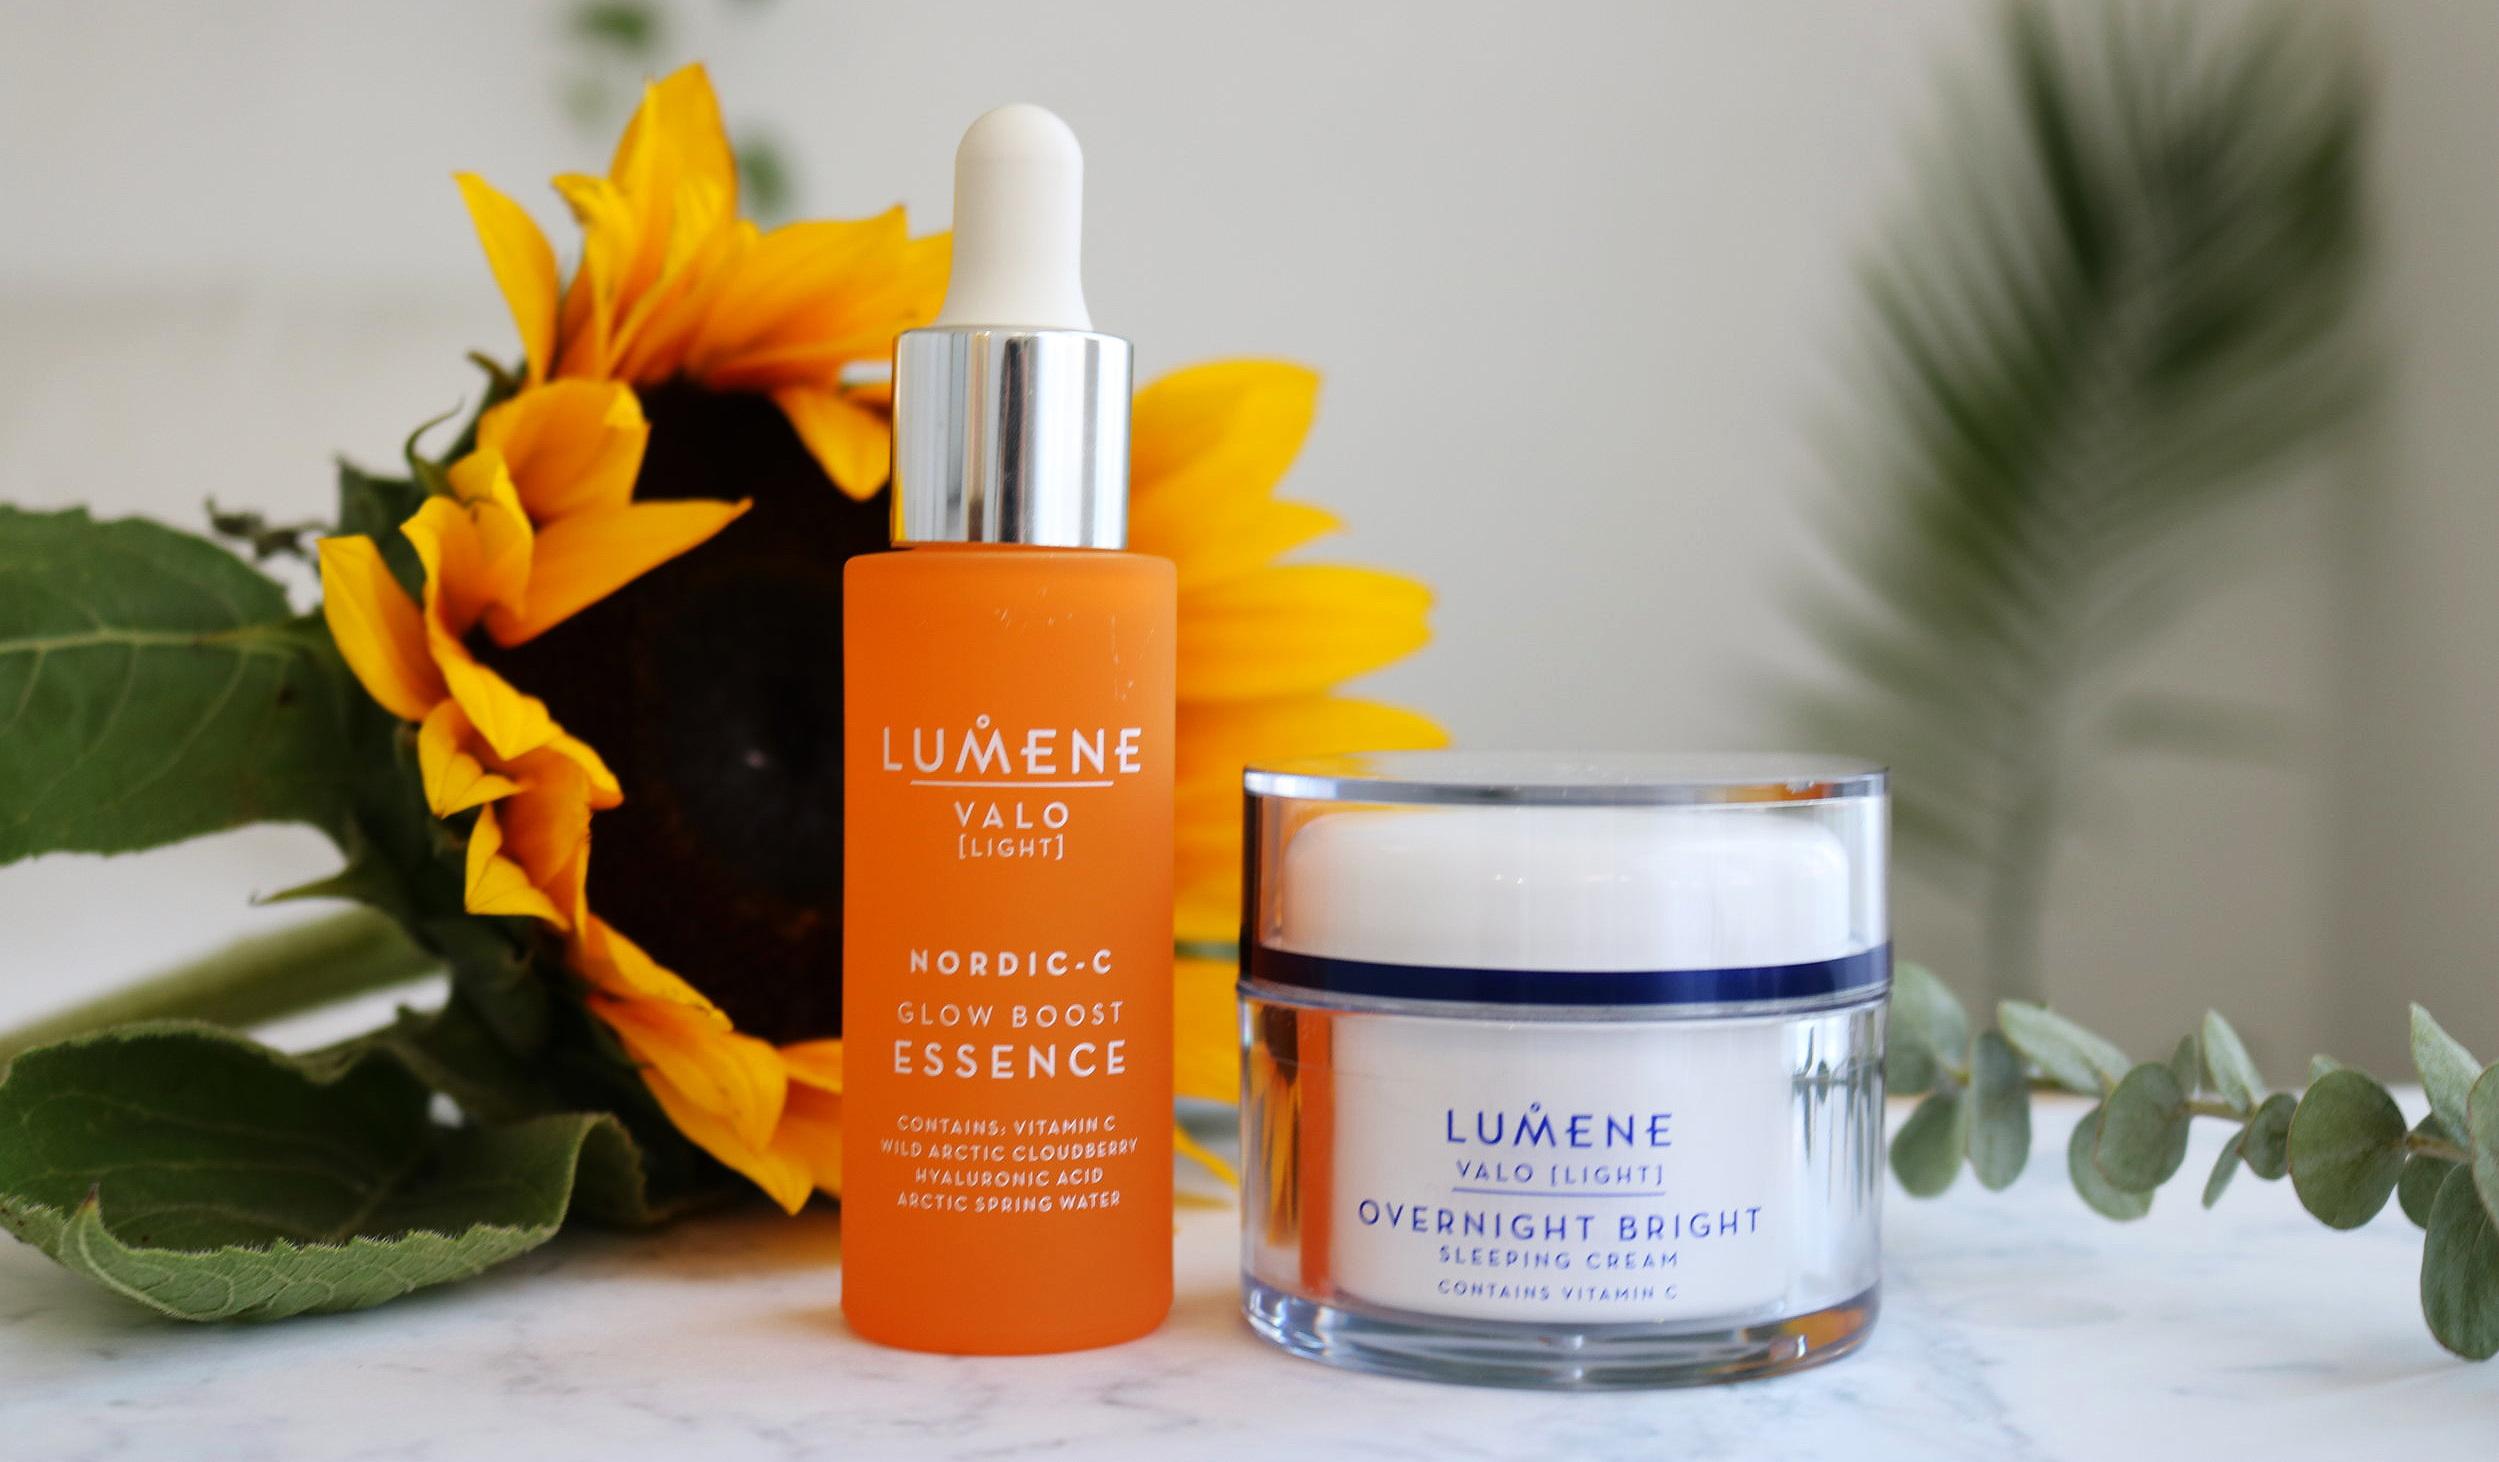 Lumene Finnish Skincare – Kessler Ramirez